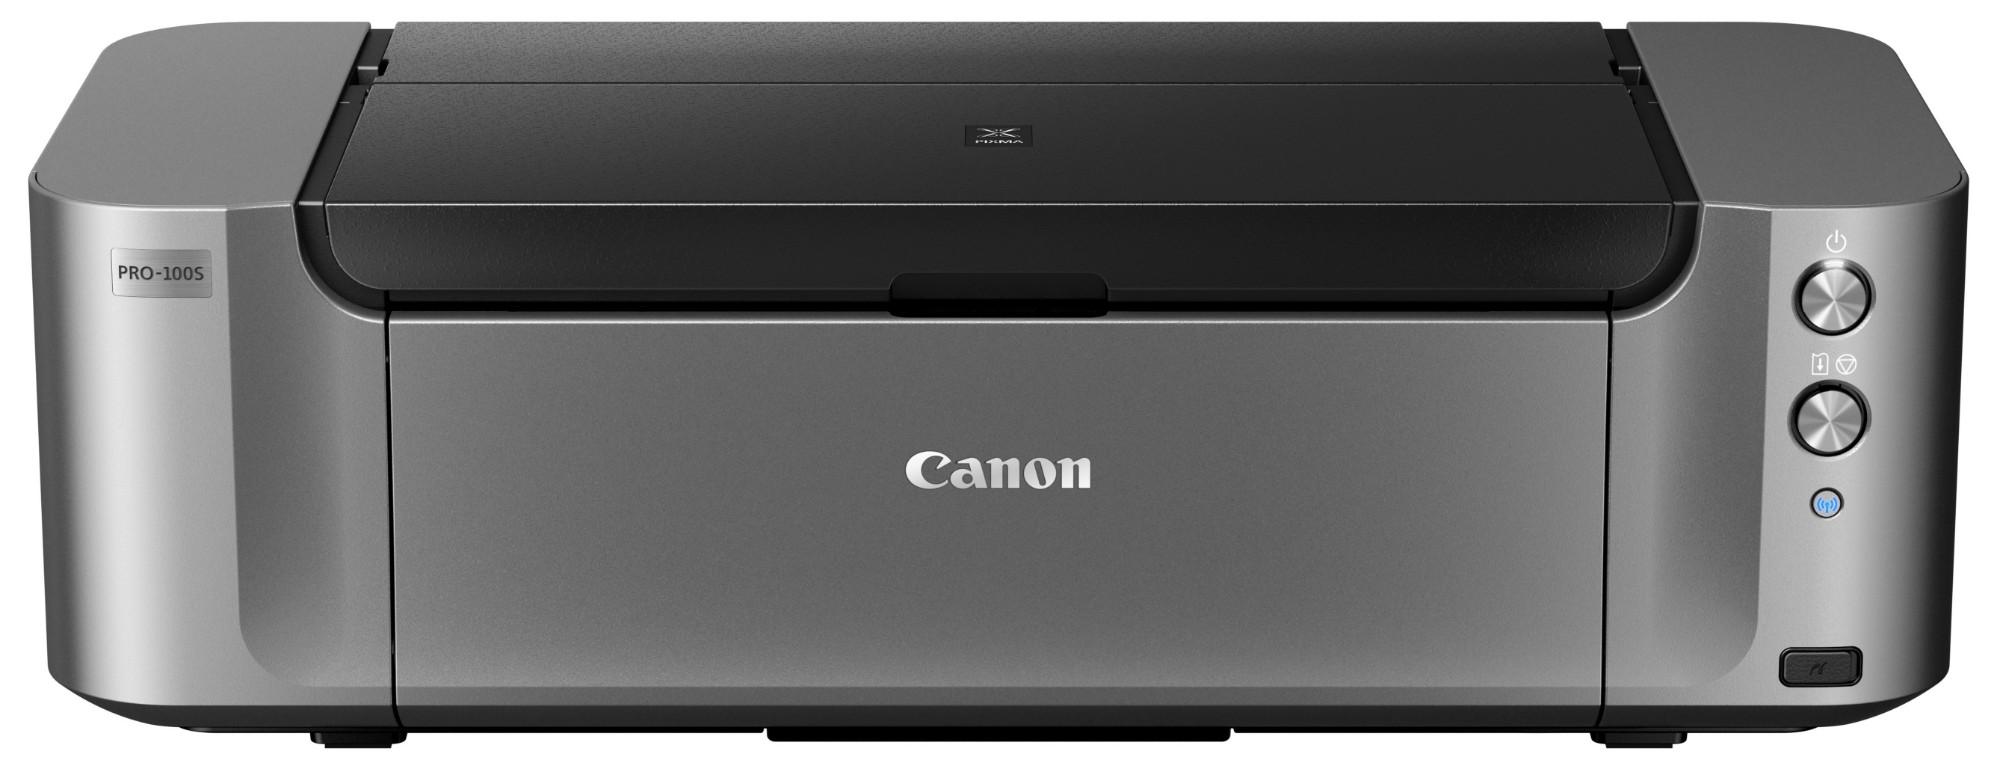 Wireless Professional Inkjet Printer Pixma Pro-100s A3 4800dpi